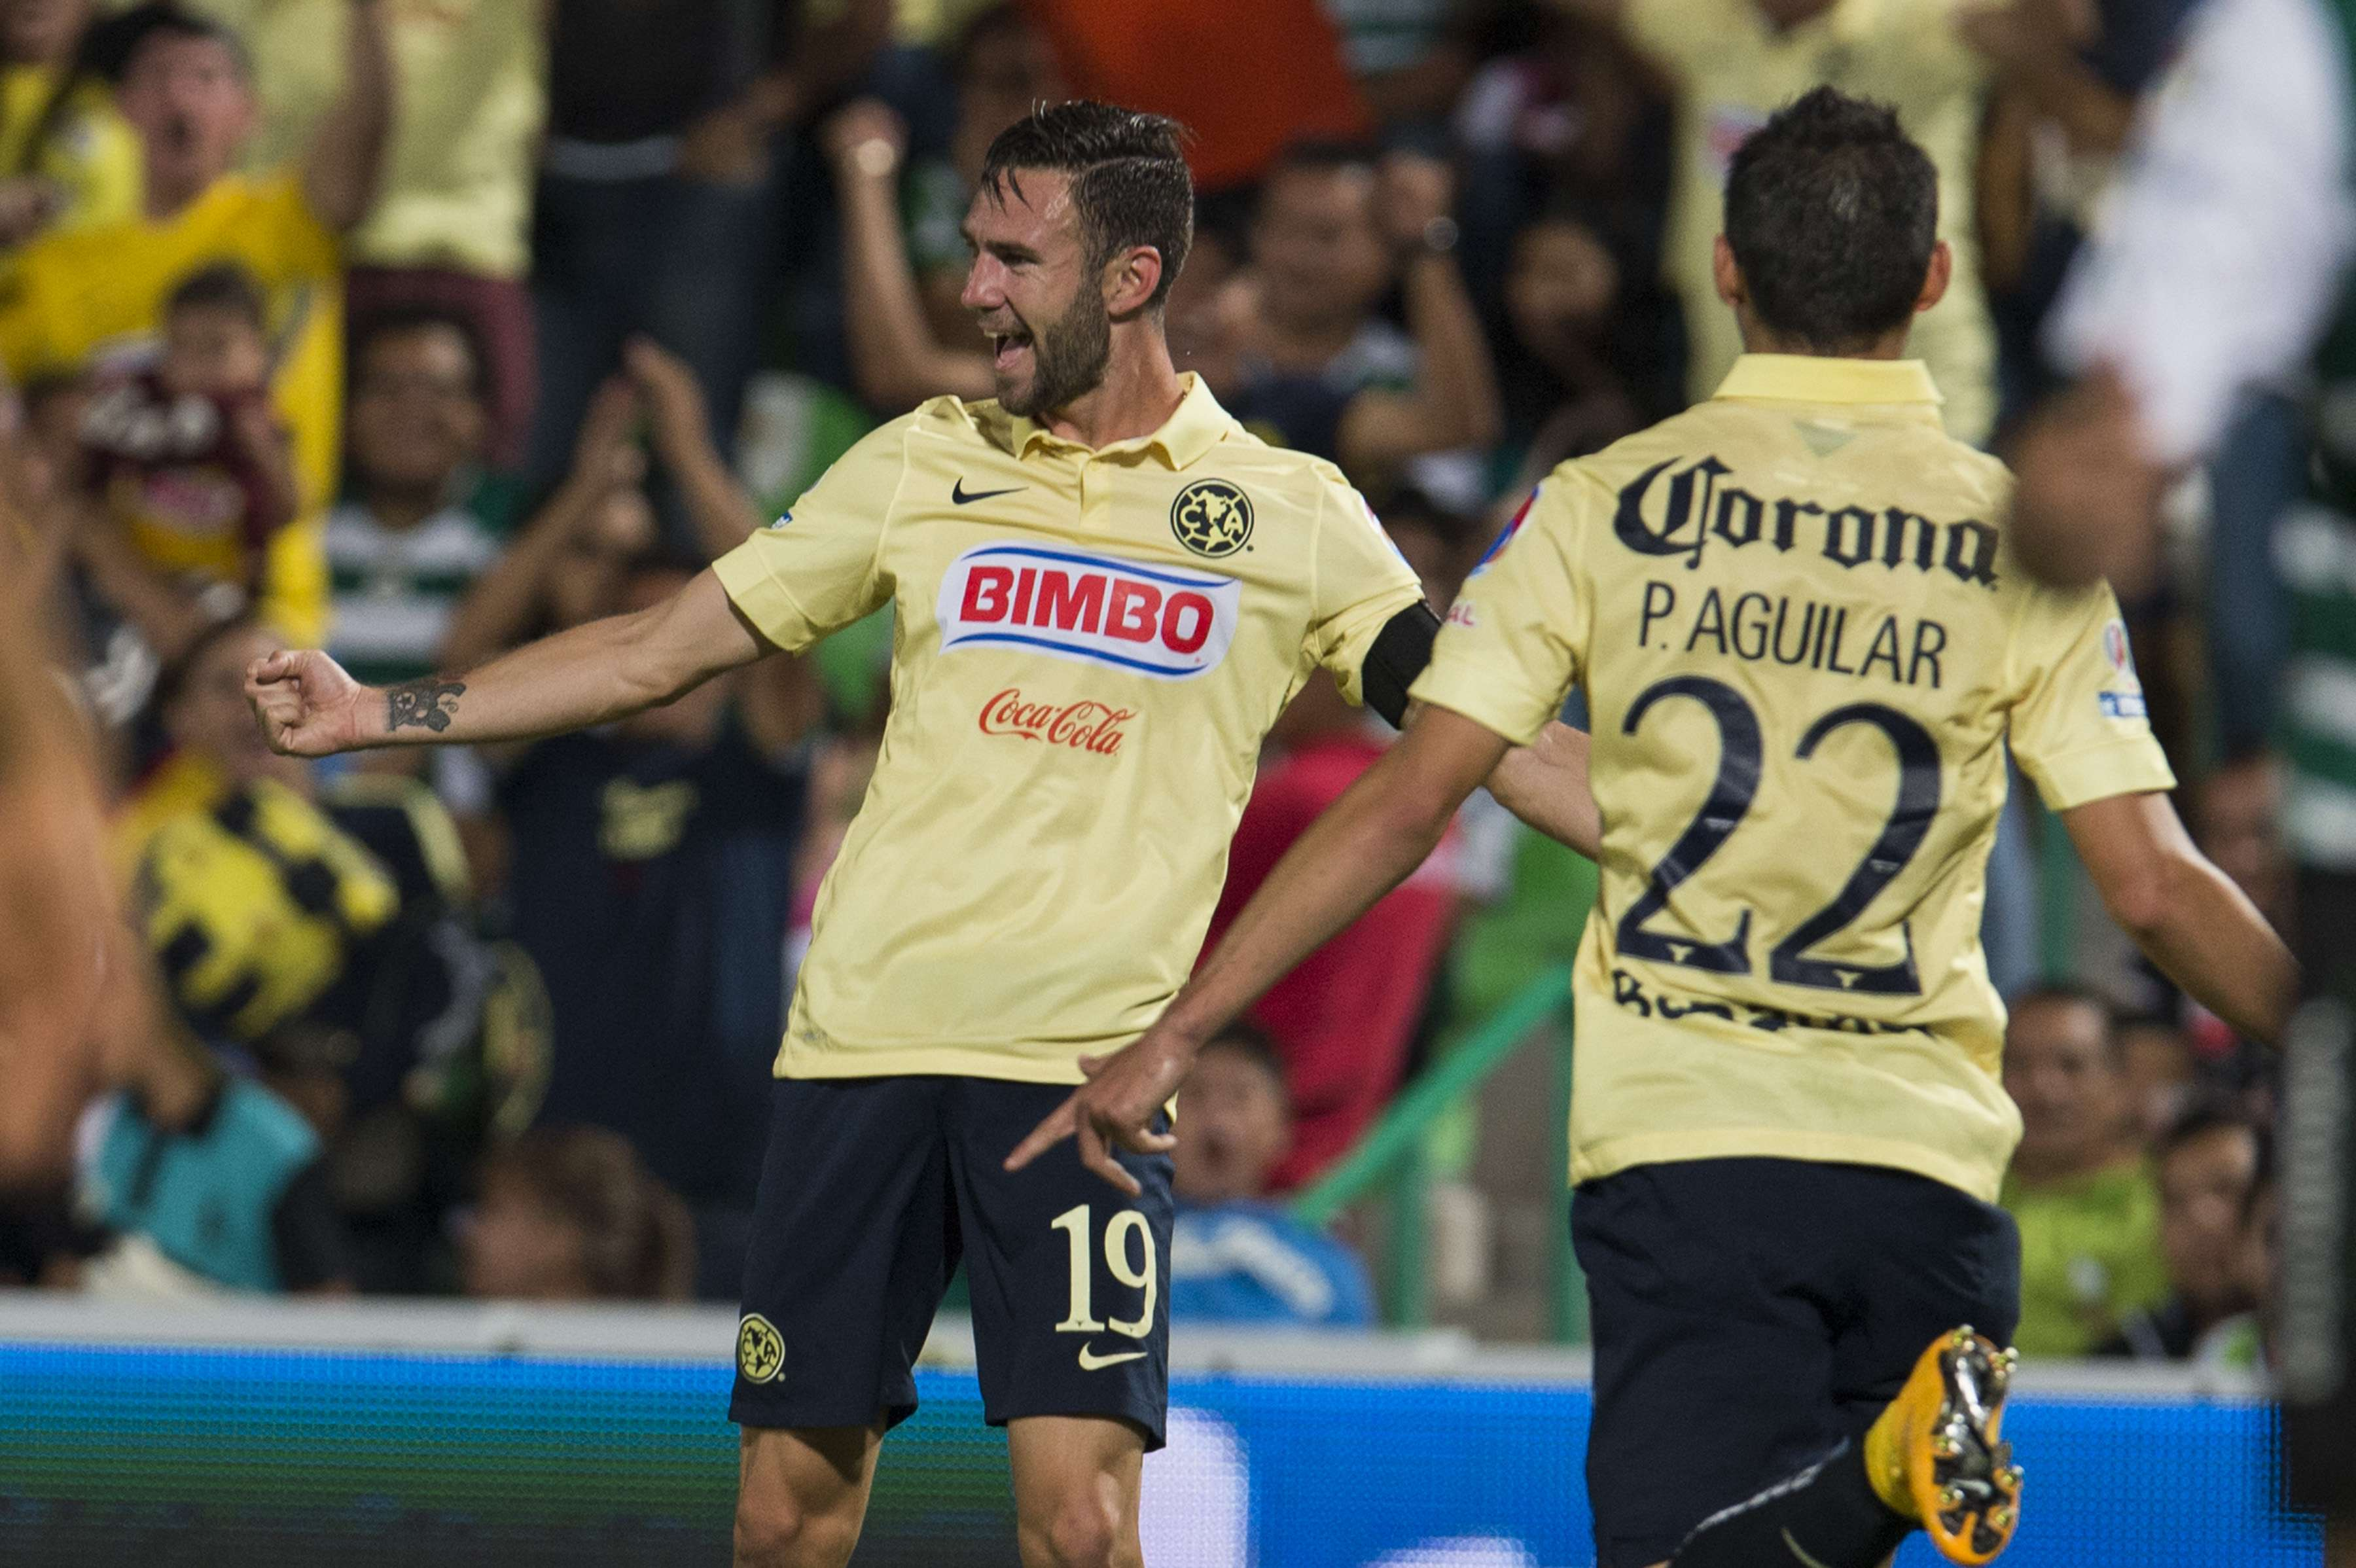 Miguel Layún abrió el marcador para América en un tiro de esquina. Foto: Mexsport